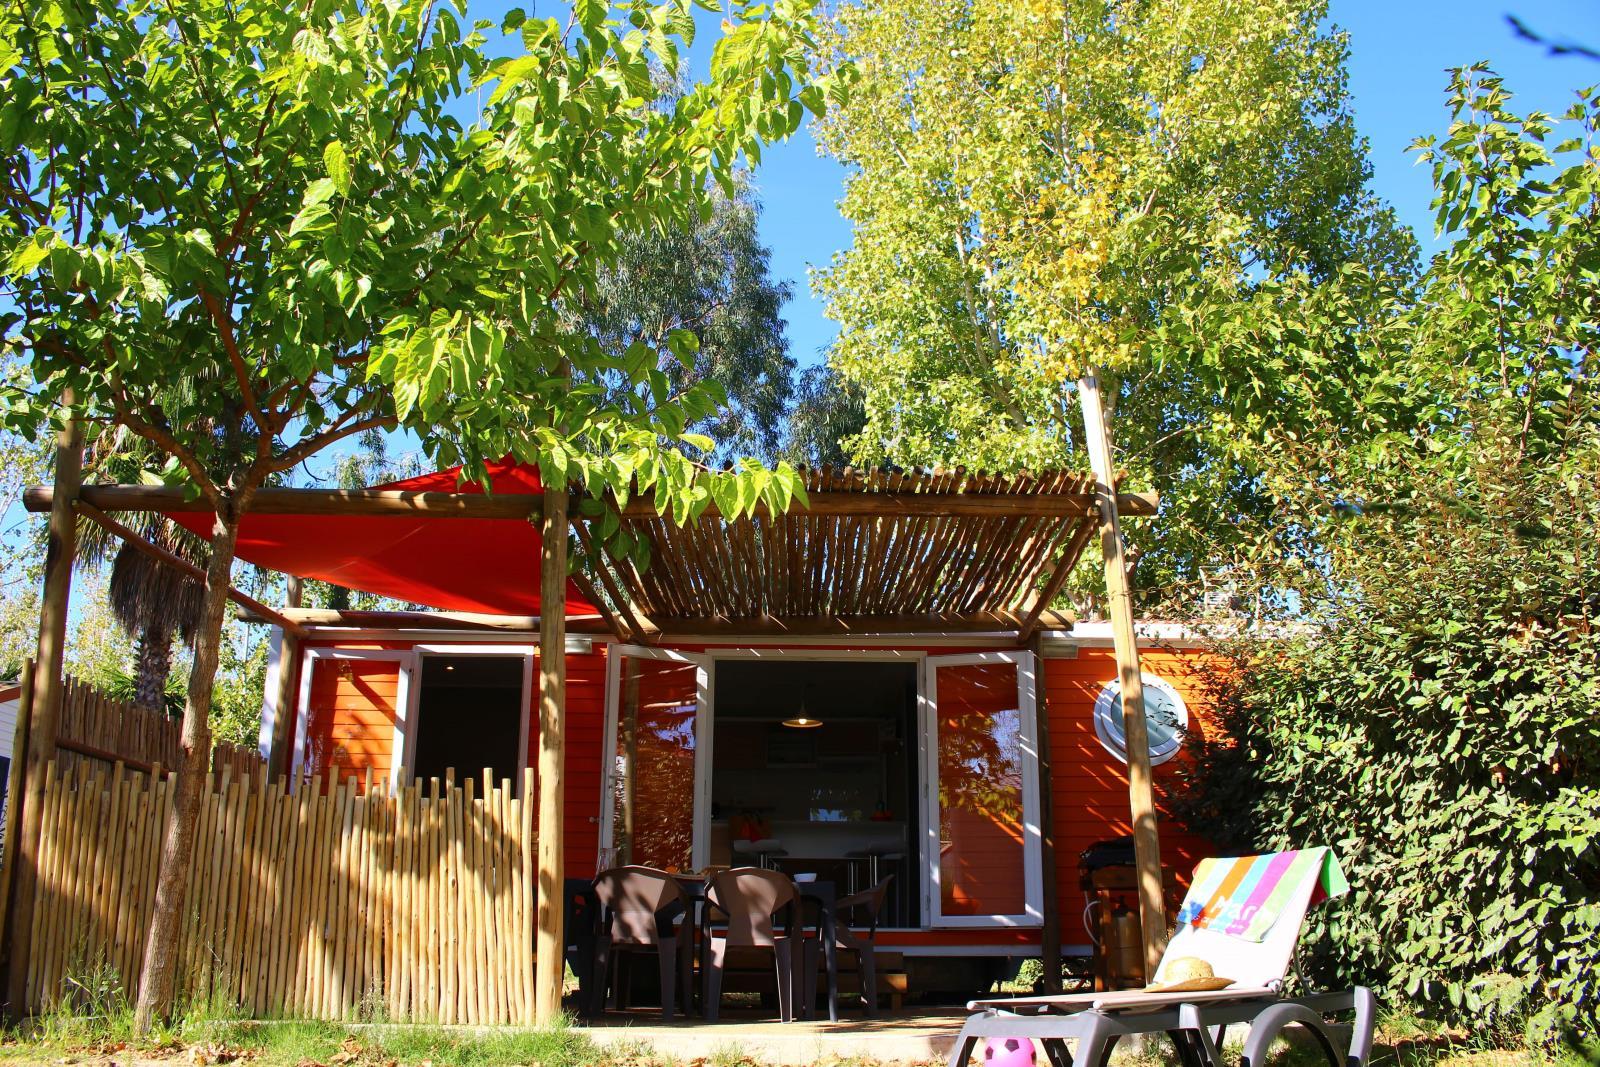 Location - Mexico Plus, Premium- Samedi - Clim & Tv & Plancha - 2 Chambres - Camping L'Air Marin